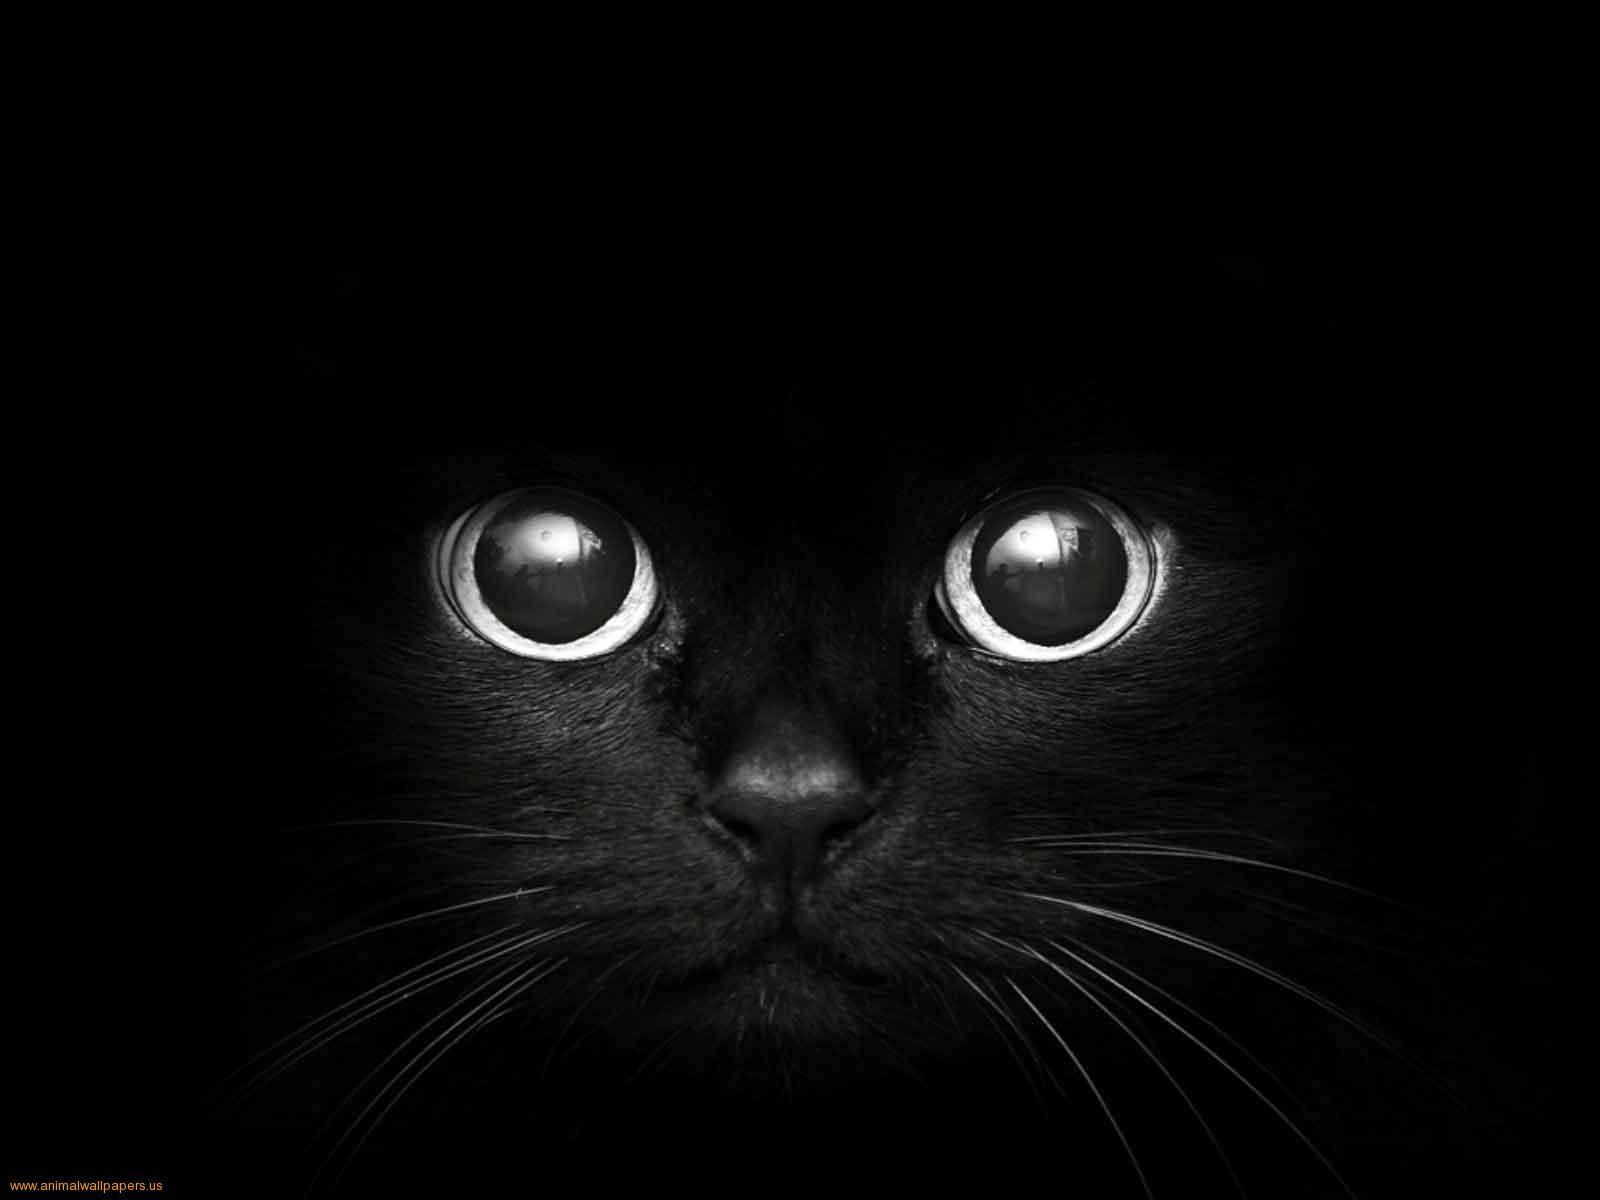 Papel de parede gato preto